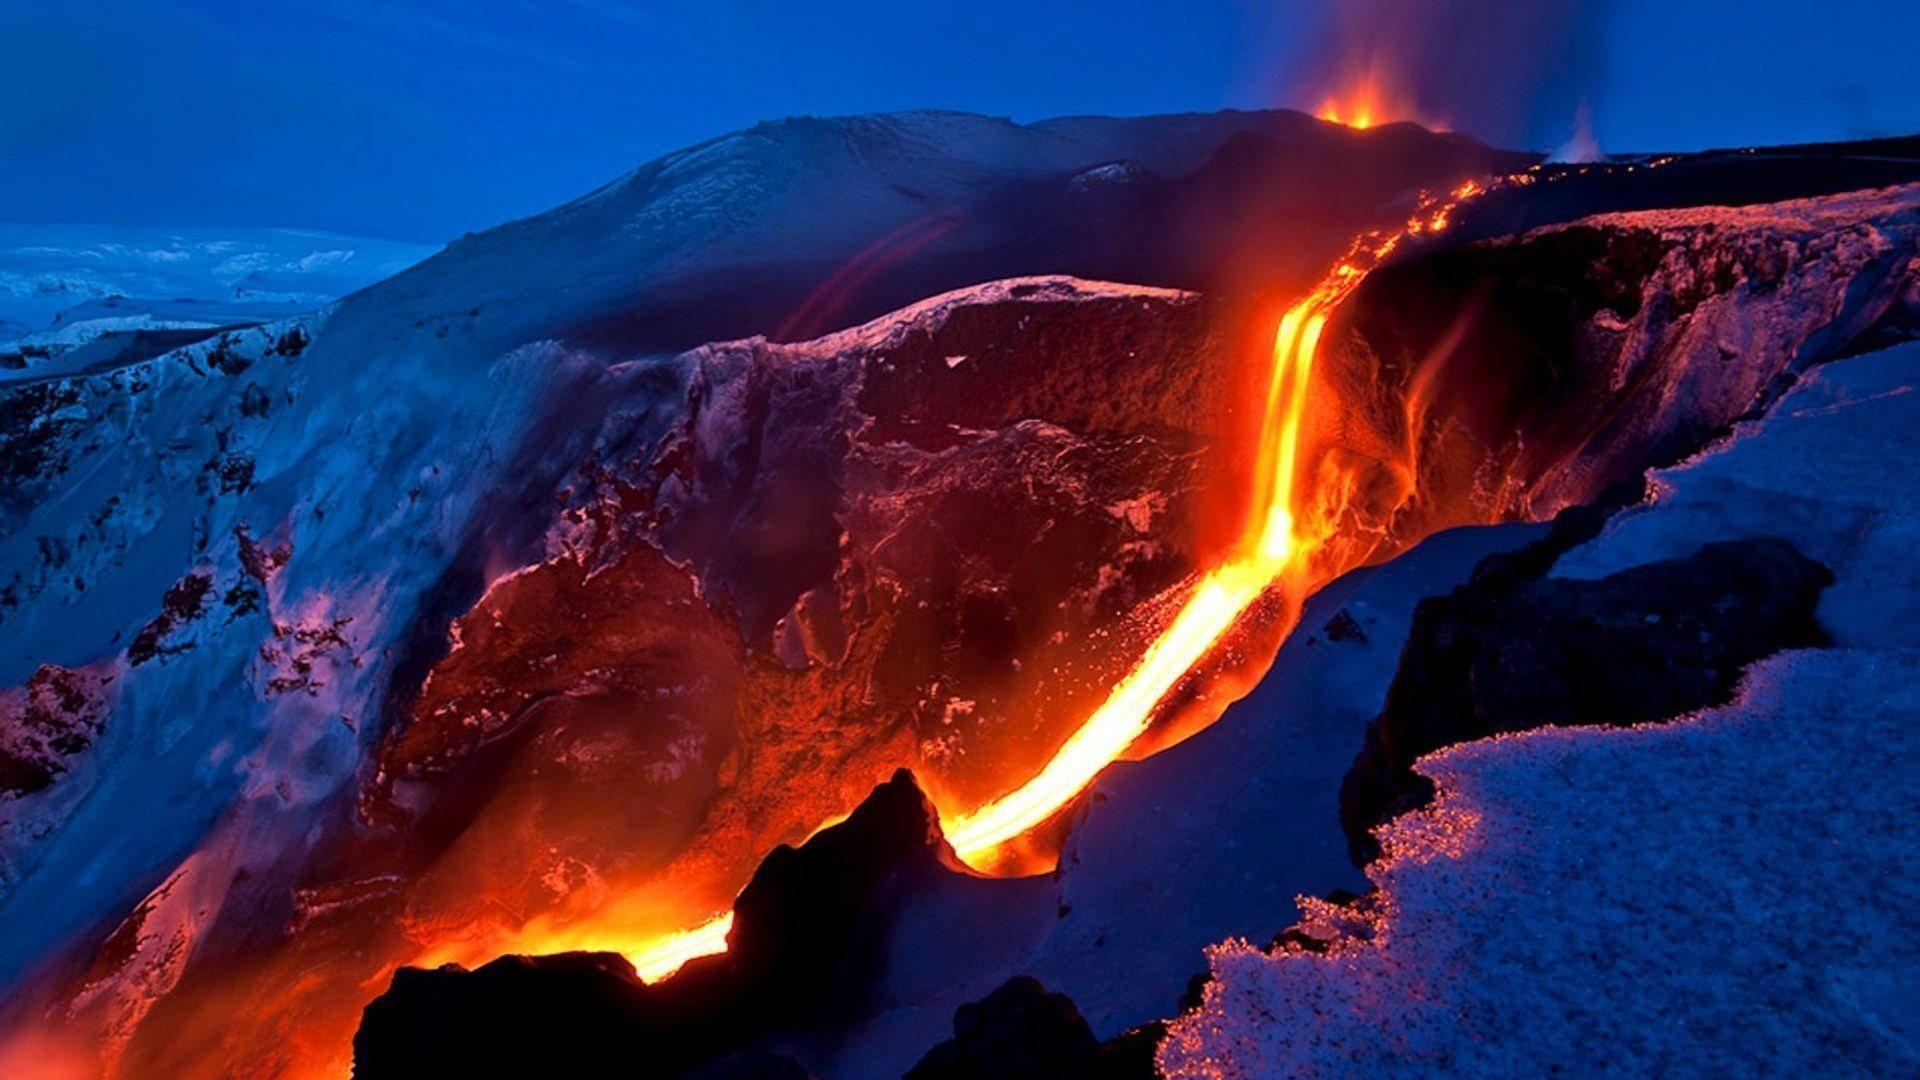 фото вулкана ампер цей день